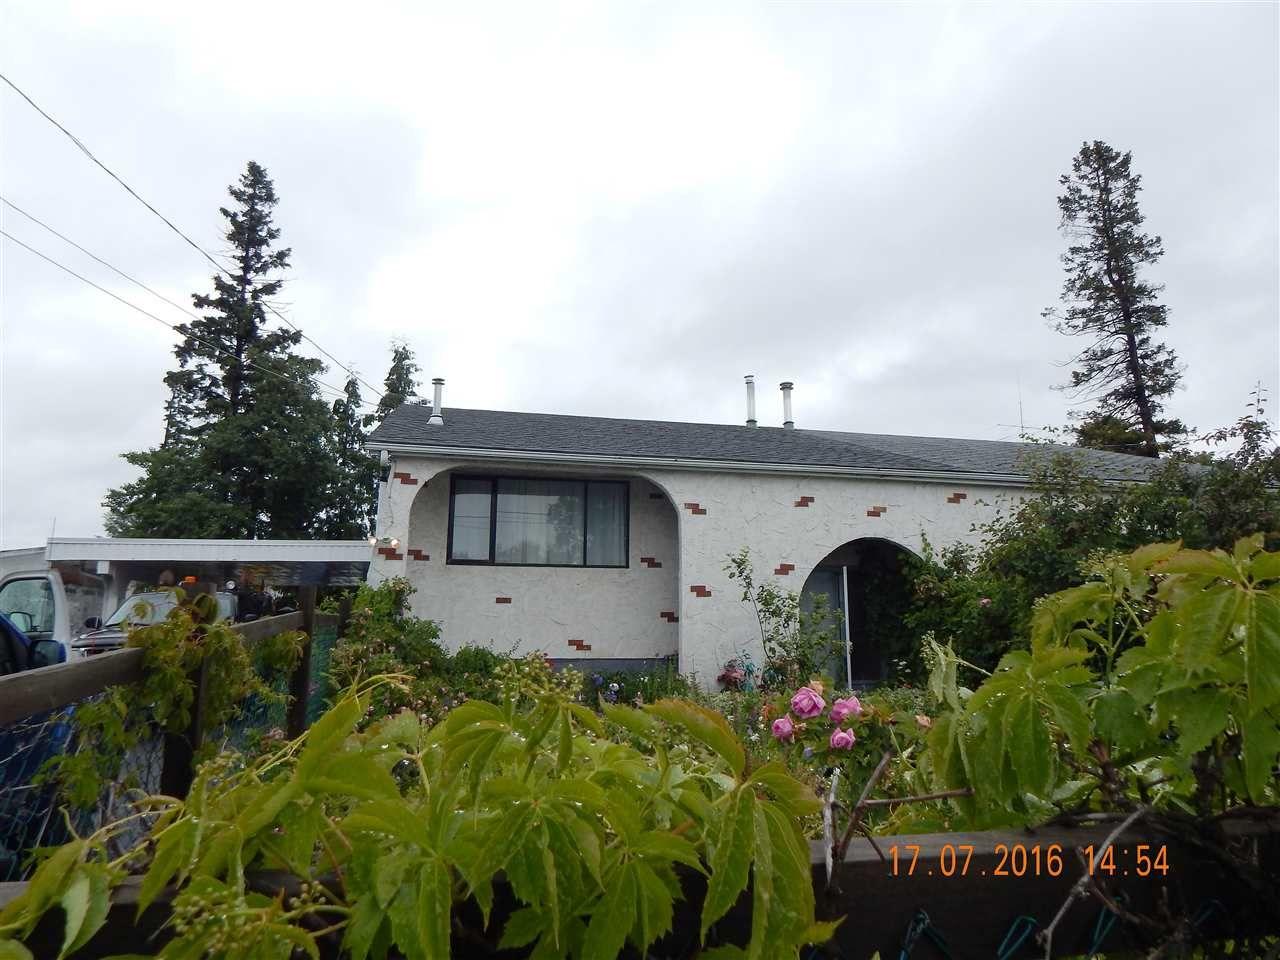 Photo 6: Photos: 2208 TAMARACK Street in Prince George: VLA 1/2 Duplex for sale (PG City Central (Zone 72))  : MLS®# R2133689